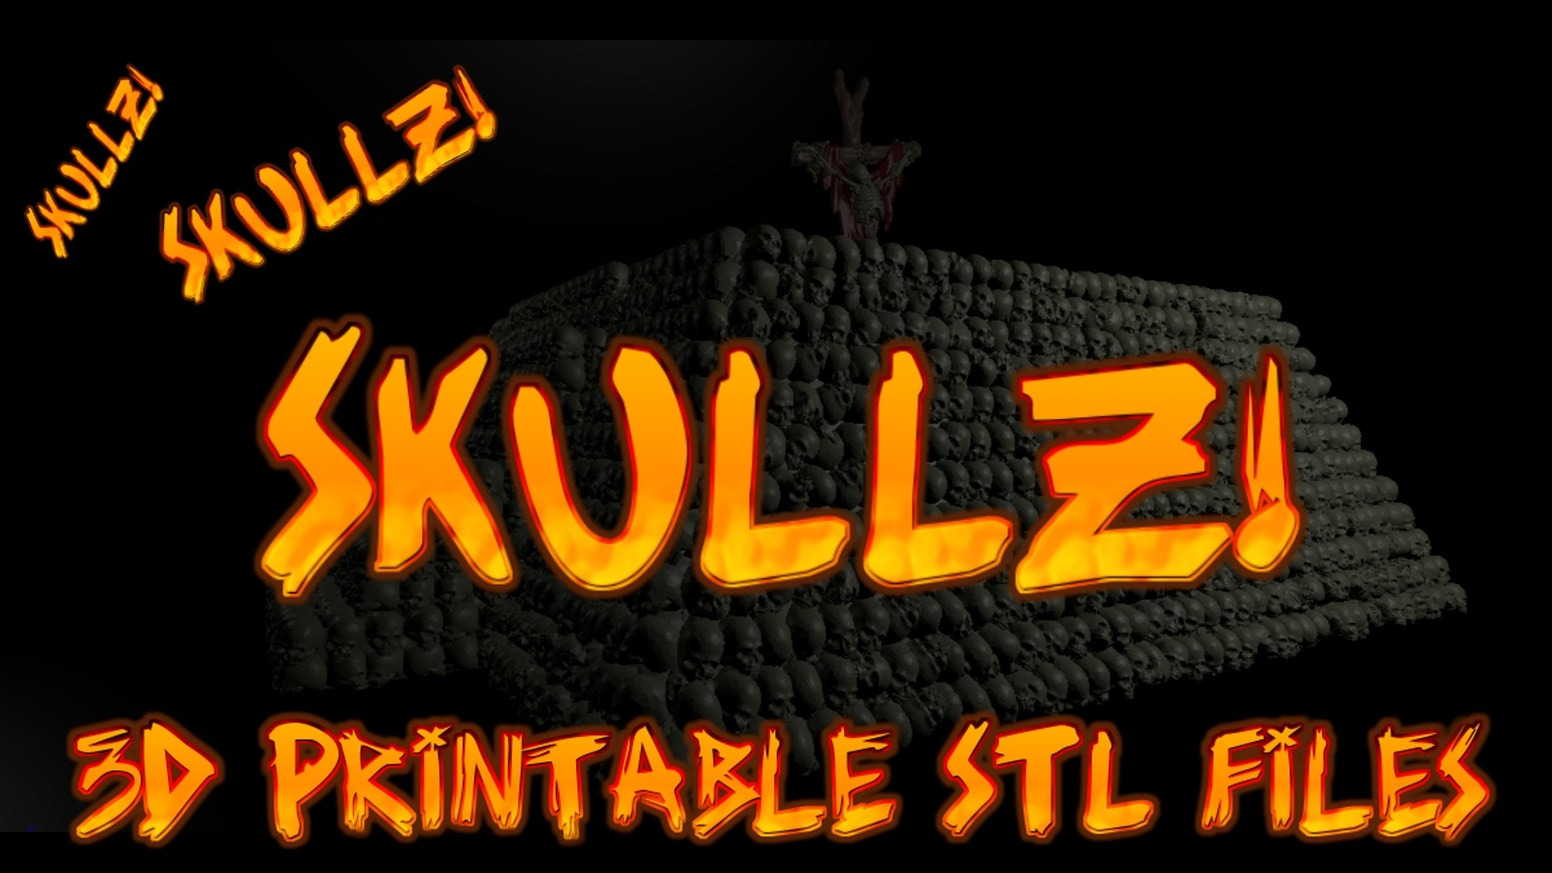 3d Printable Skull themed terrain scaled for 28mm wargaming. SKULLZ SKULLZ SKULLZ!